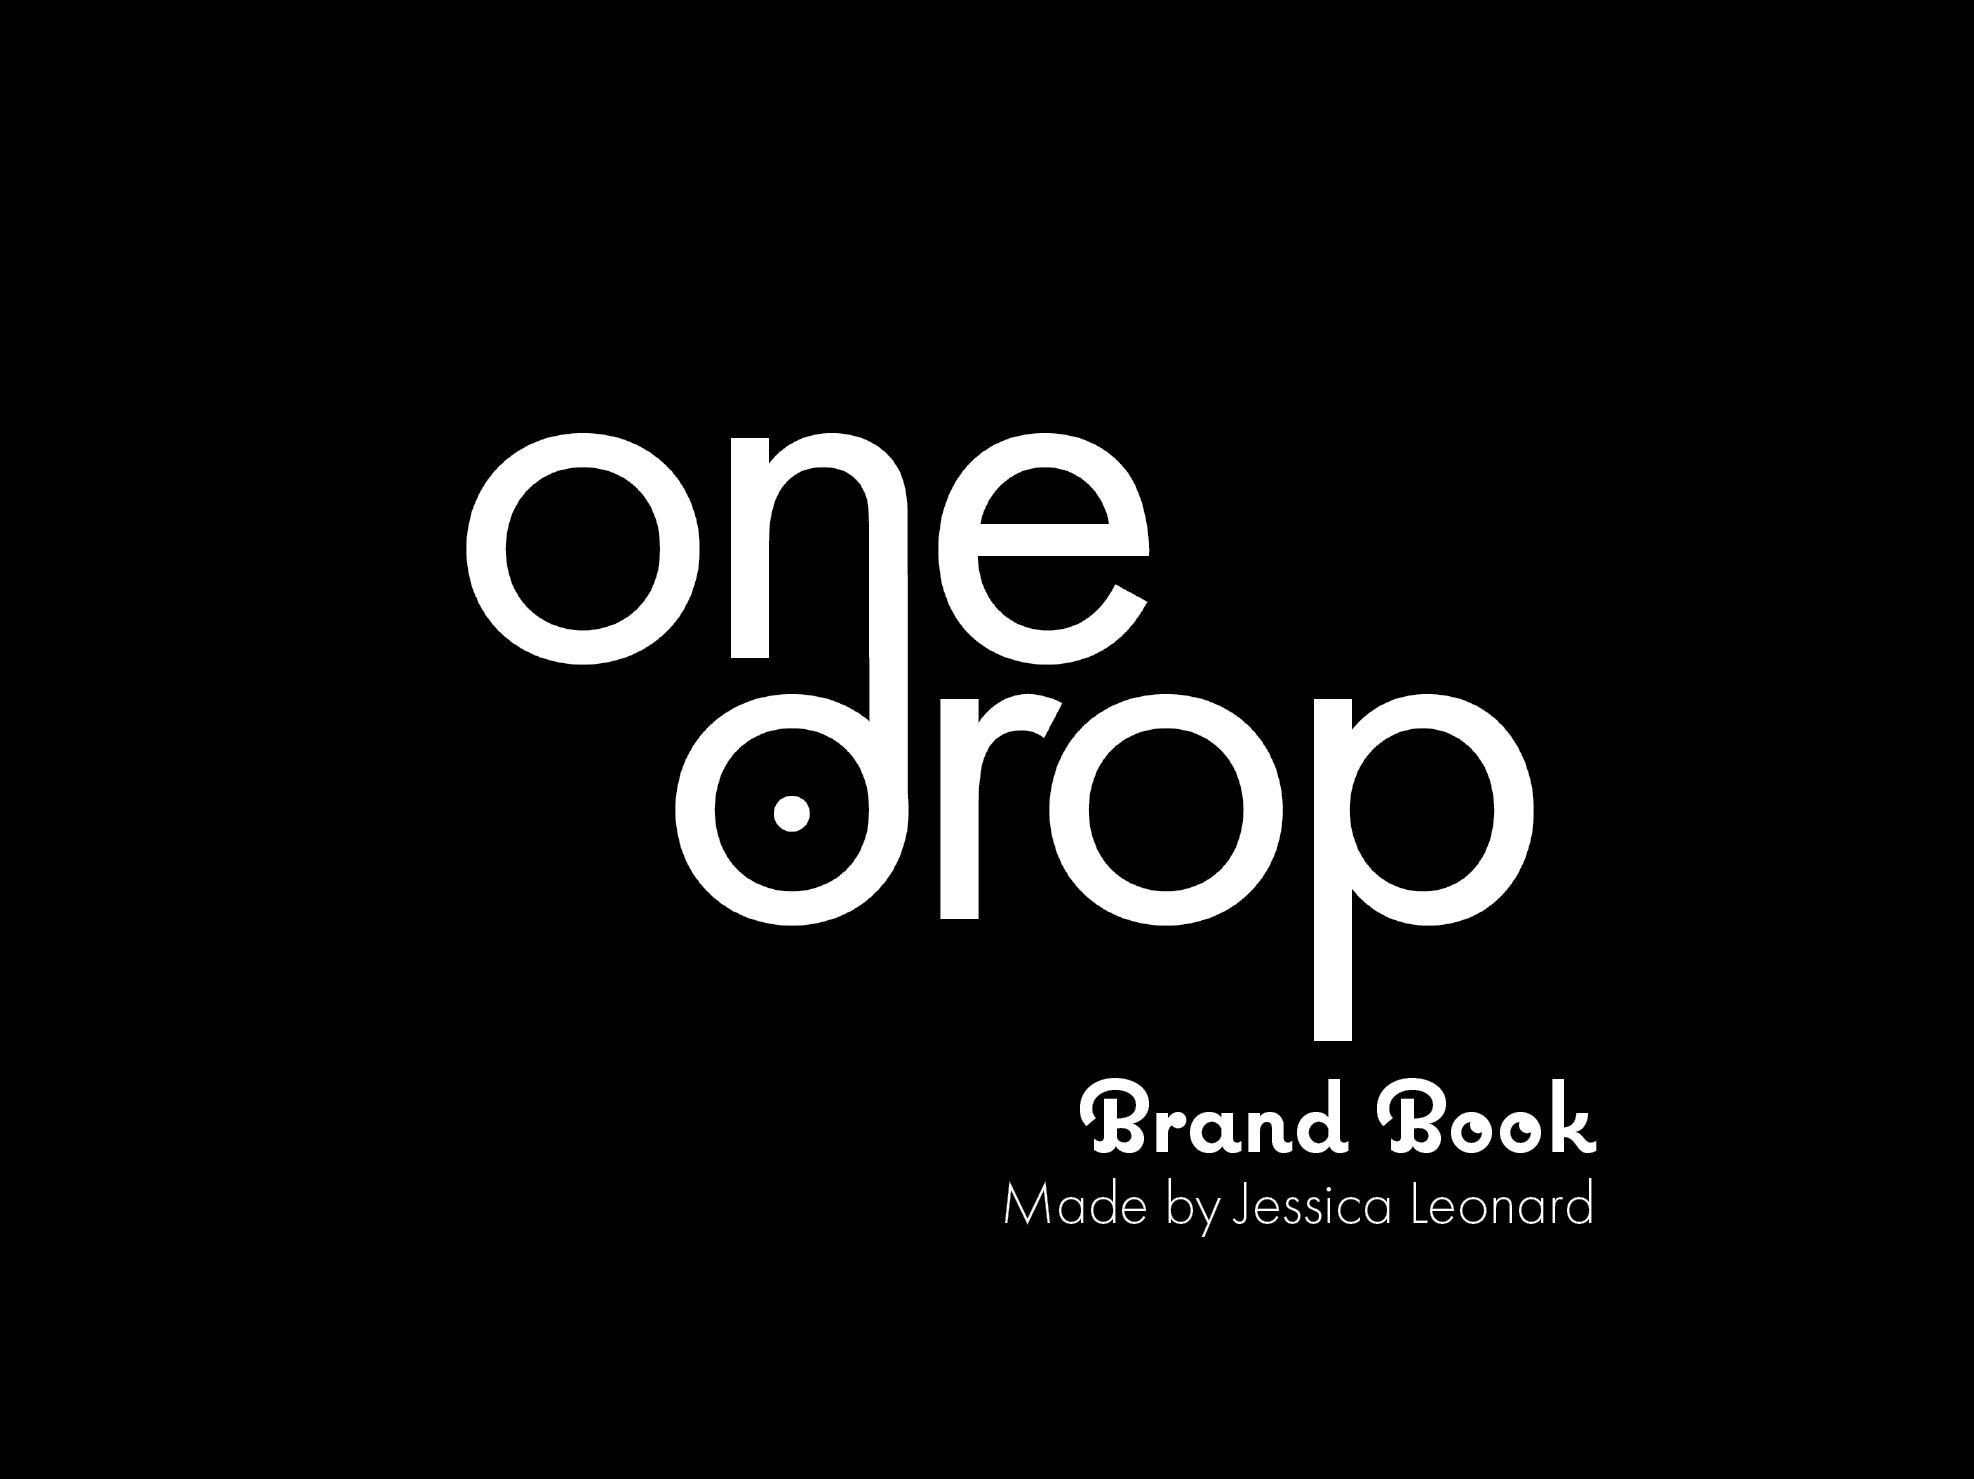 brandbook FRONT.JPG